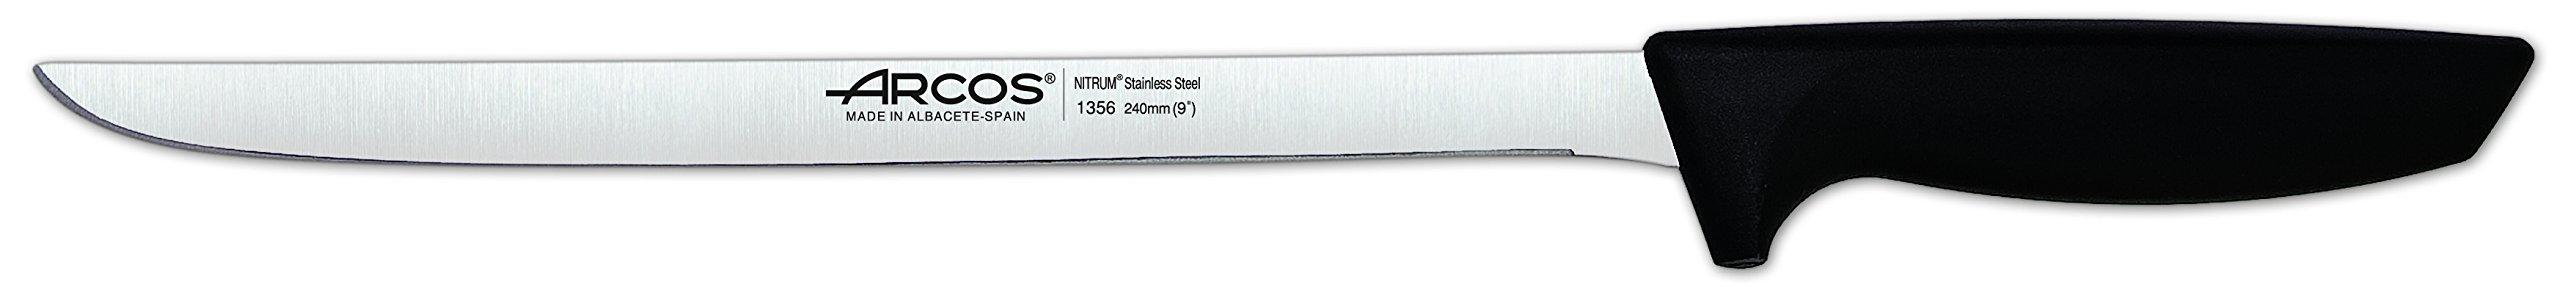 Arcos Niza Spanish flexible Slicing Ham Knife by ARCOS